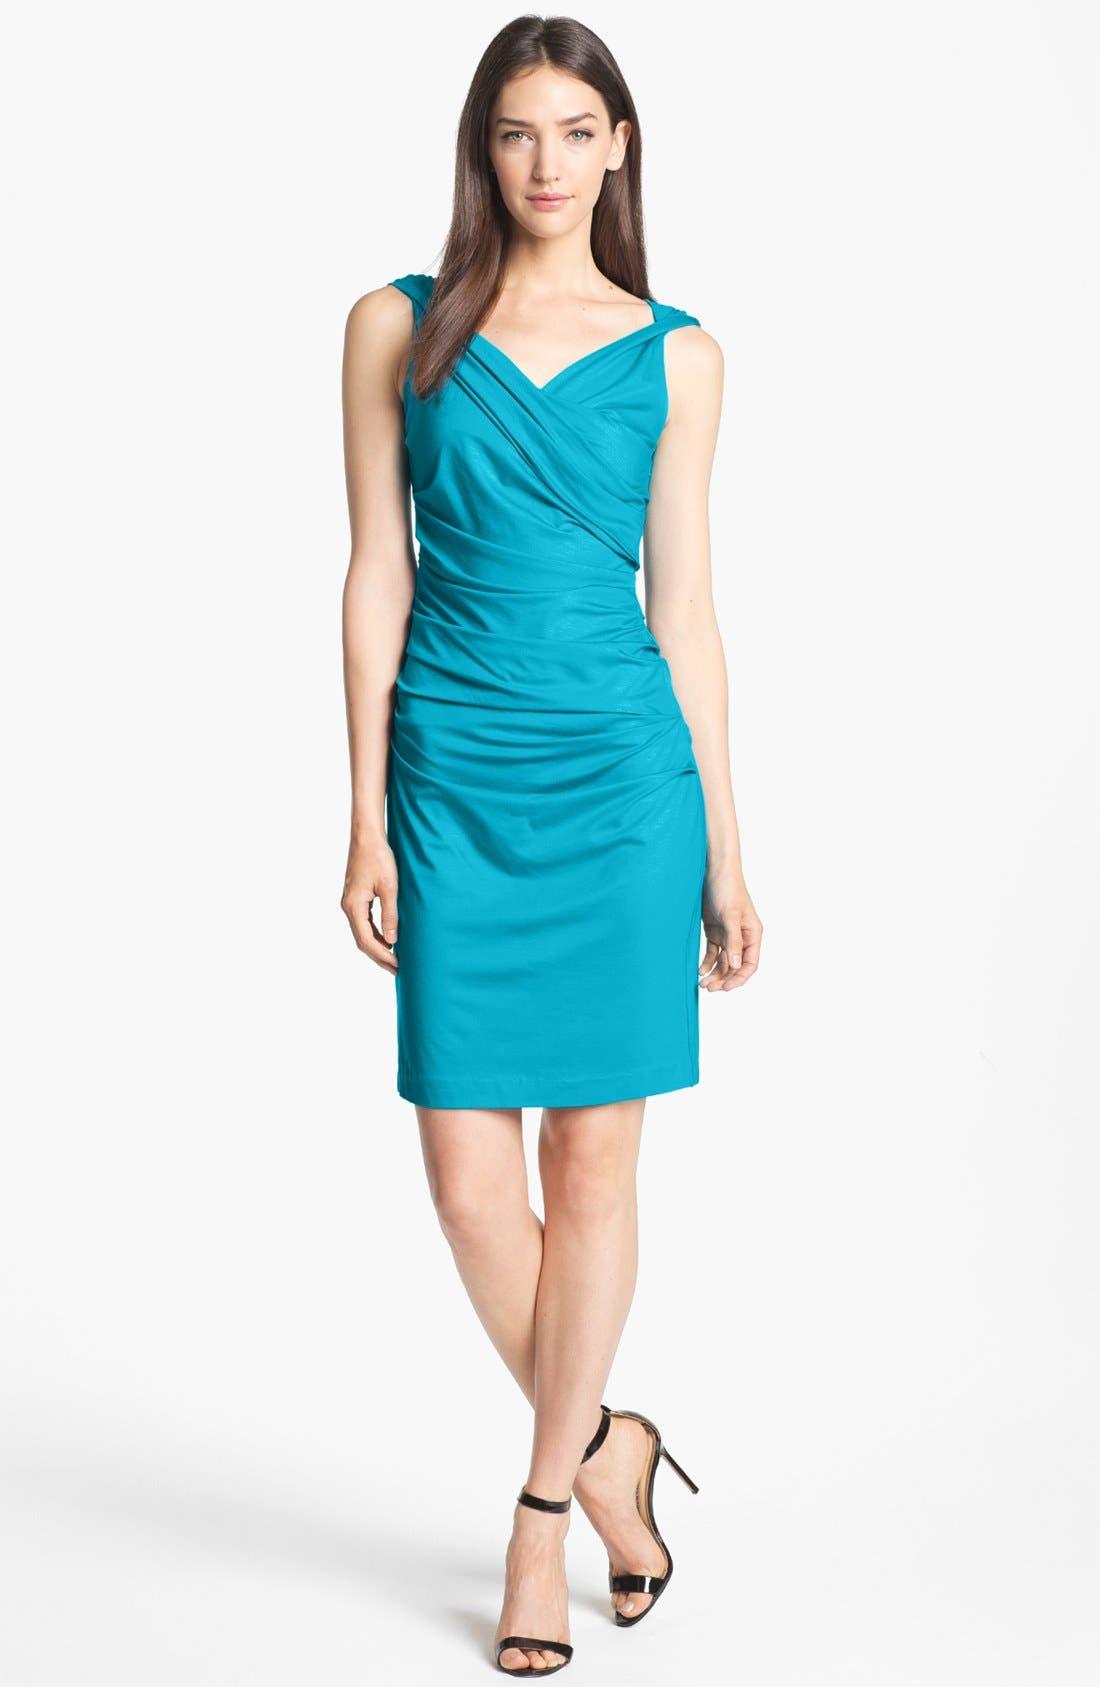 Alternate Image 1 Selected - Diane von Furstenberg 'Bentley' Sleeveless Sheath Dress